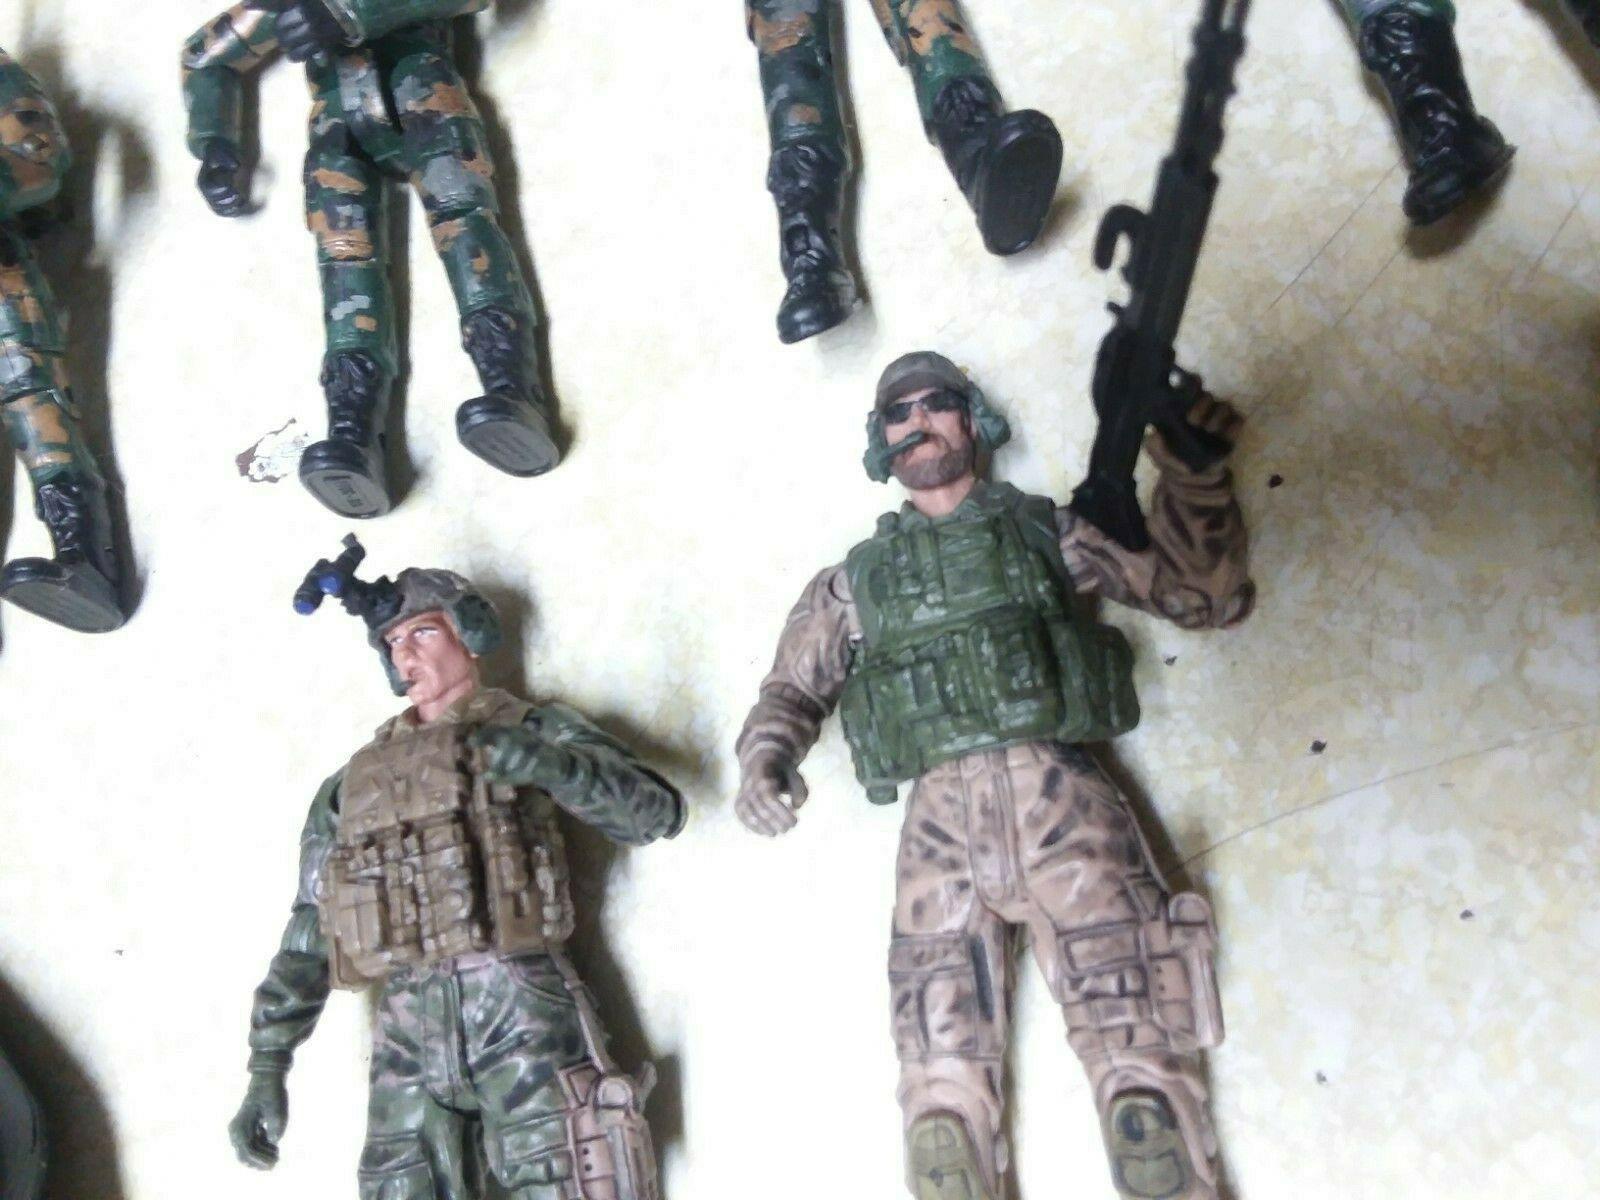 Action 1:18 Elite Force play Set Toy Ranger set